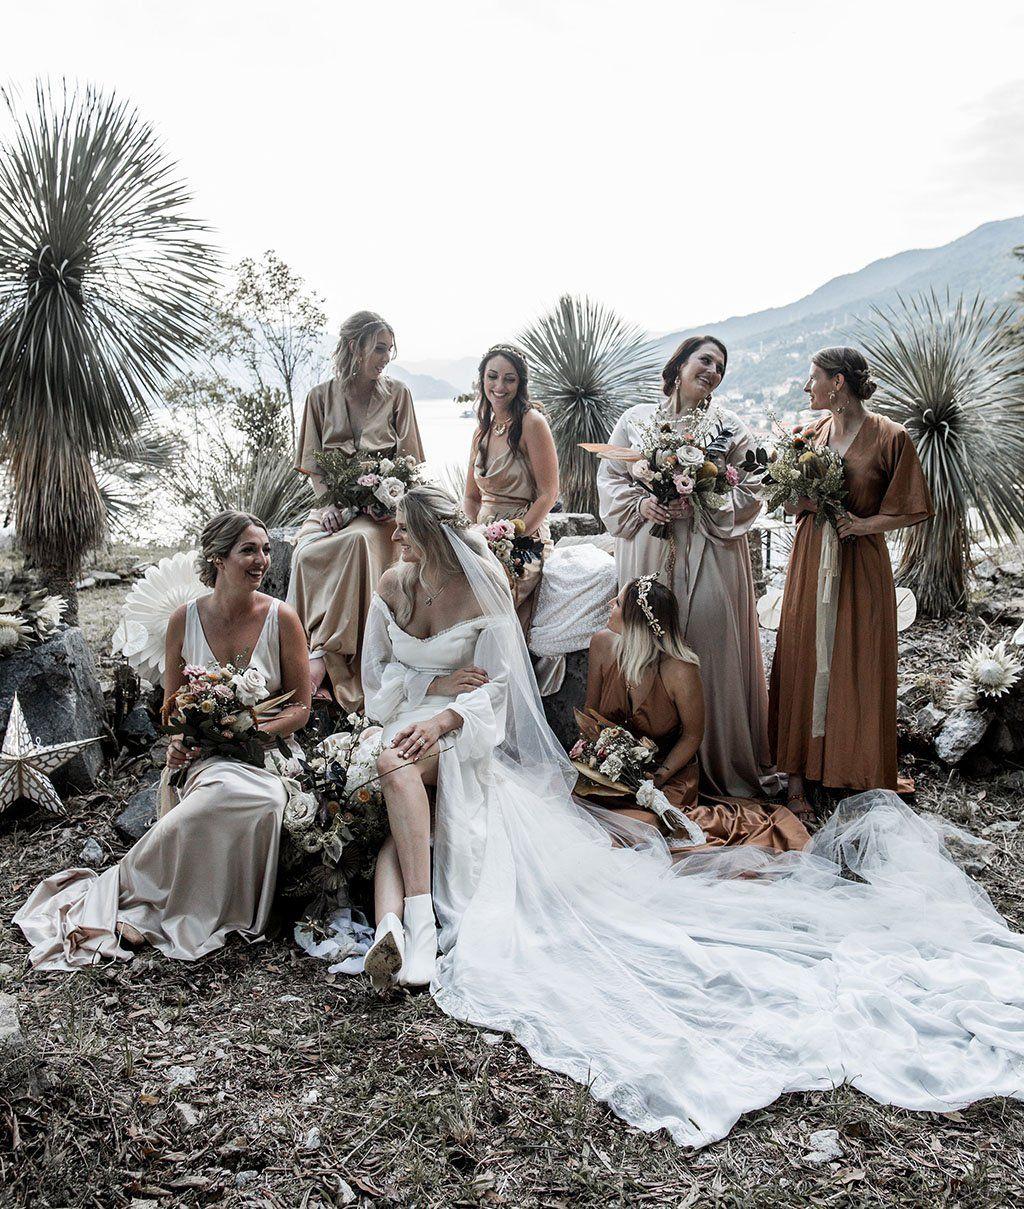 19cf58021c39 Daughters of Simone Co-Owner's Vintage-Inspired Boho Bliss Italian ...